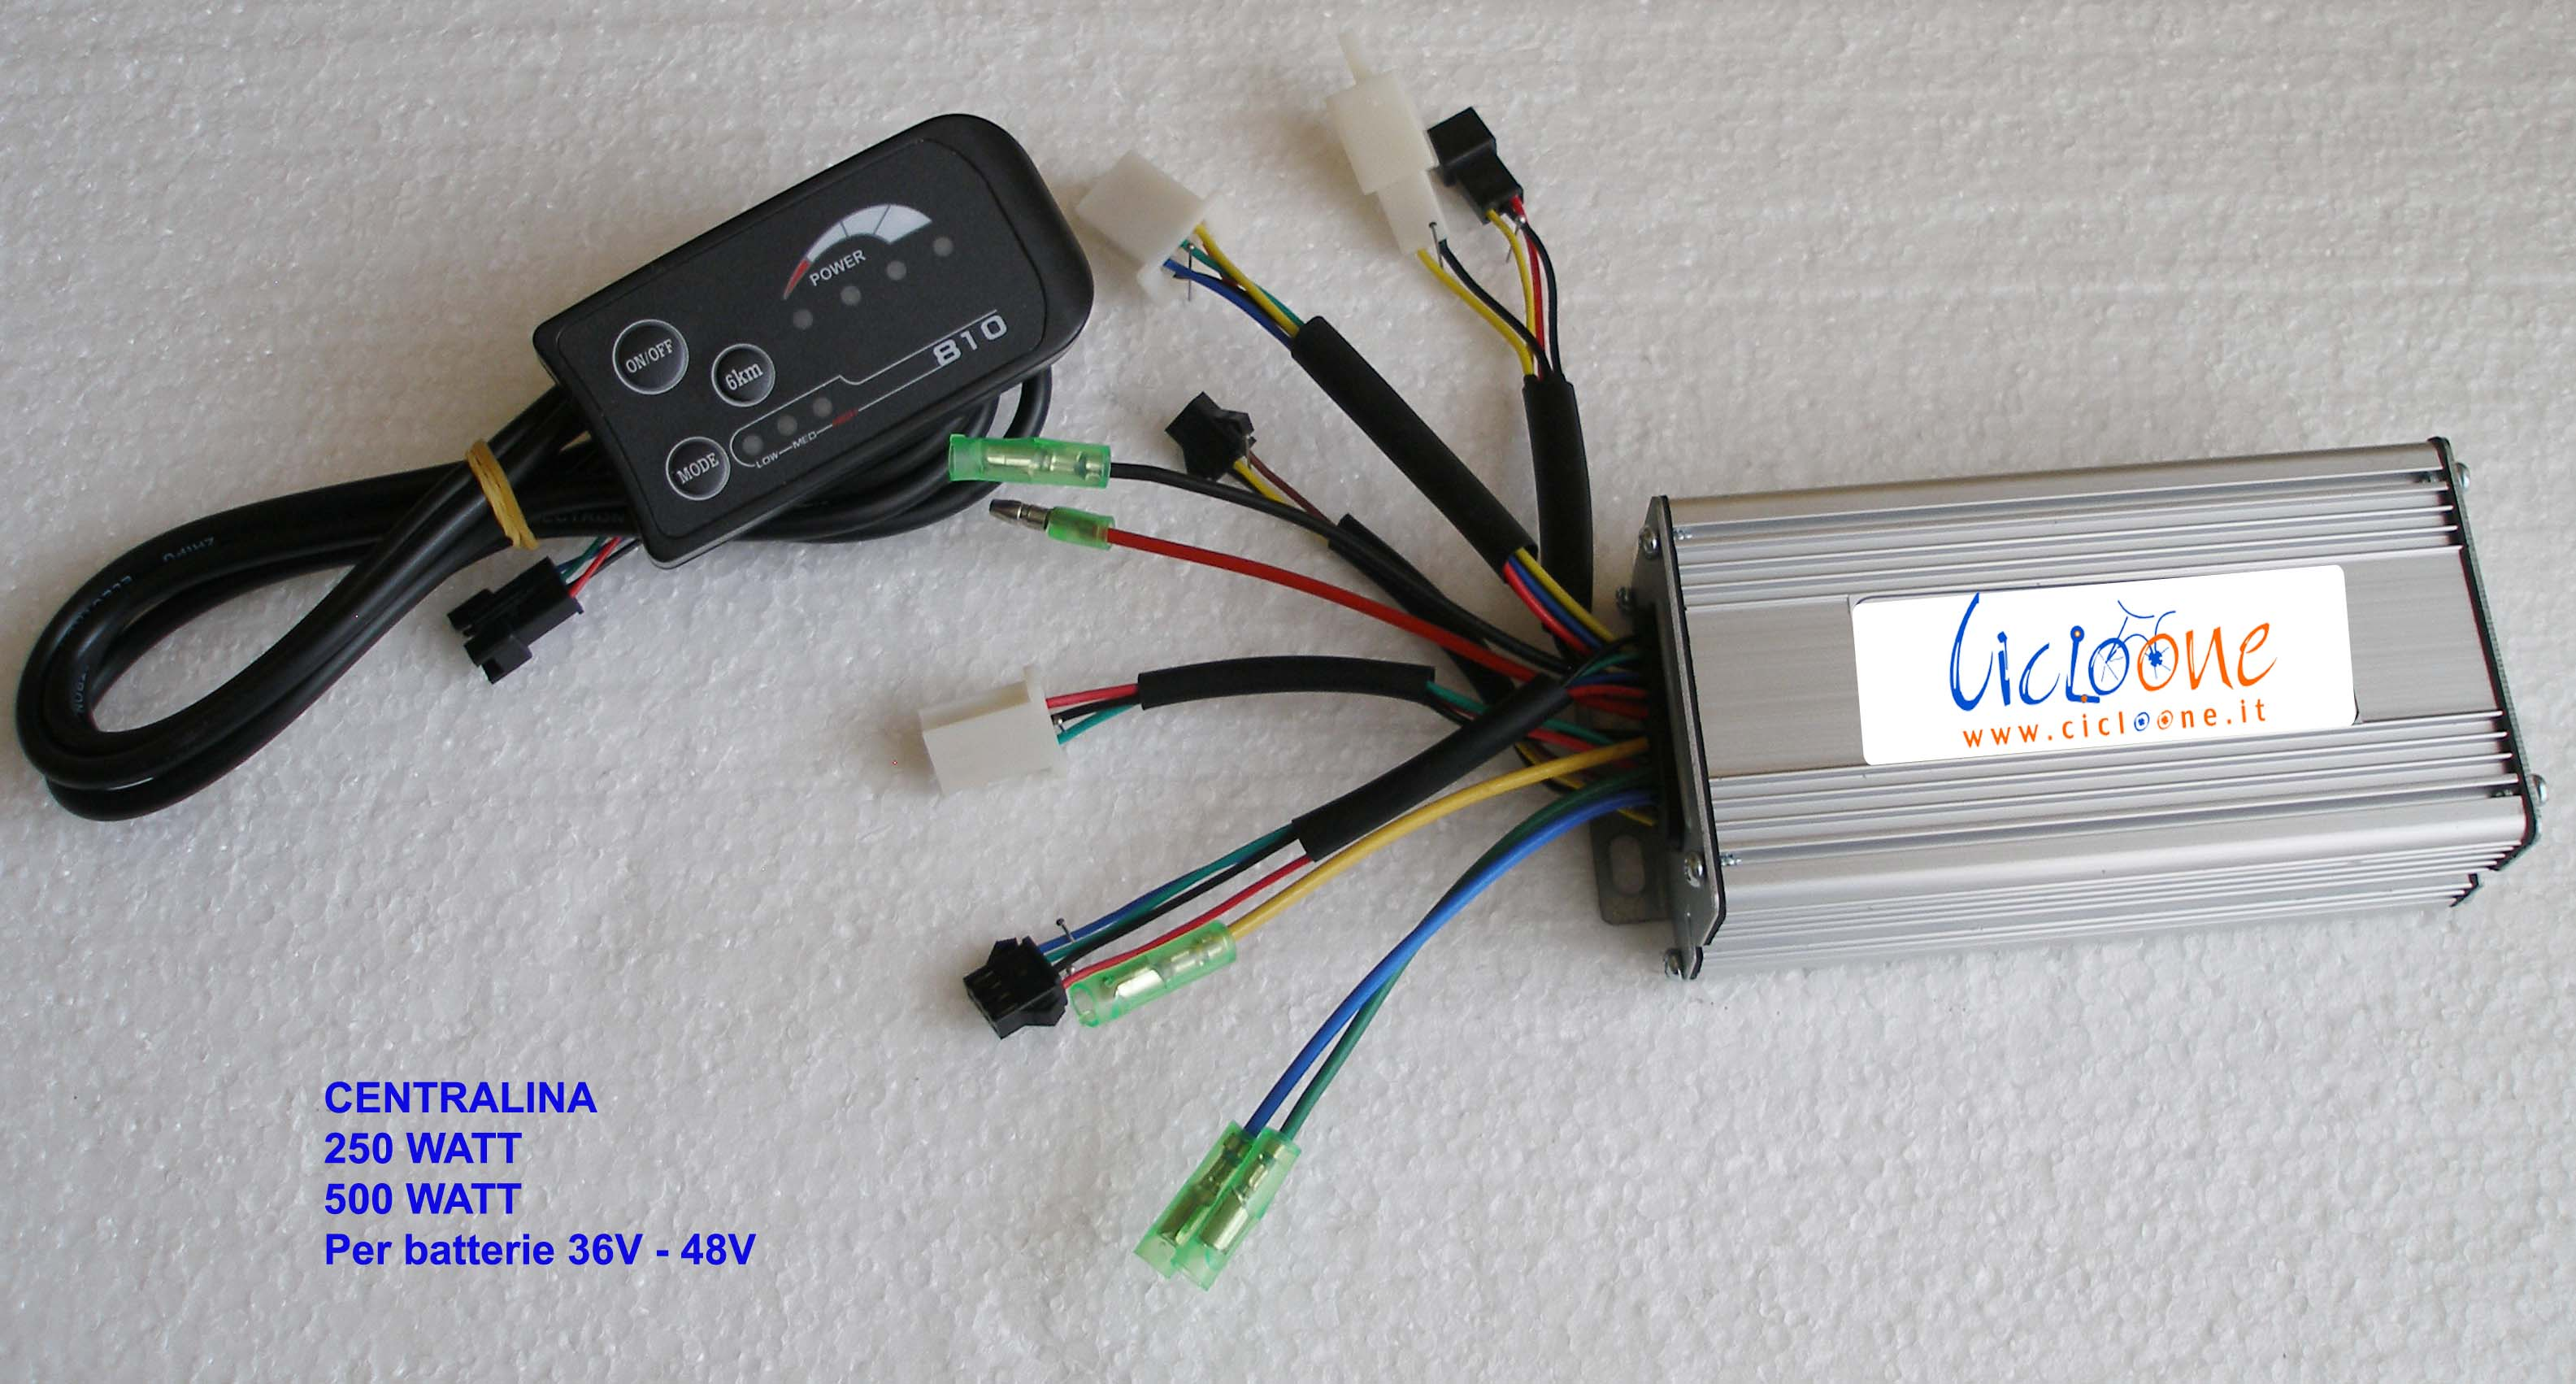 centralina sensor sensorless con display 810